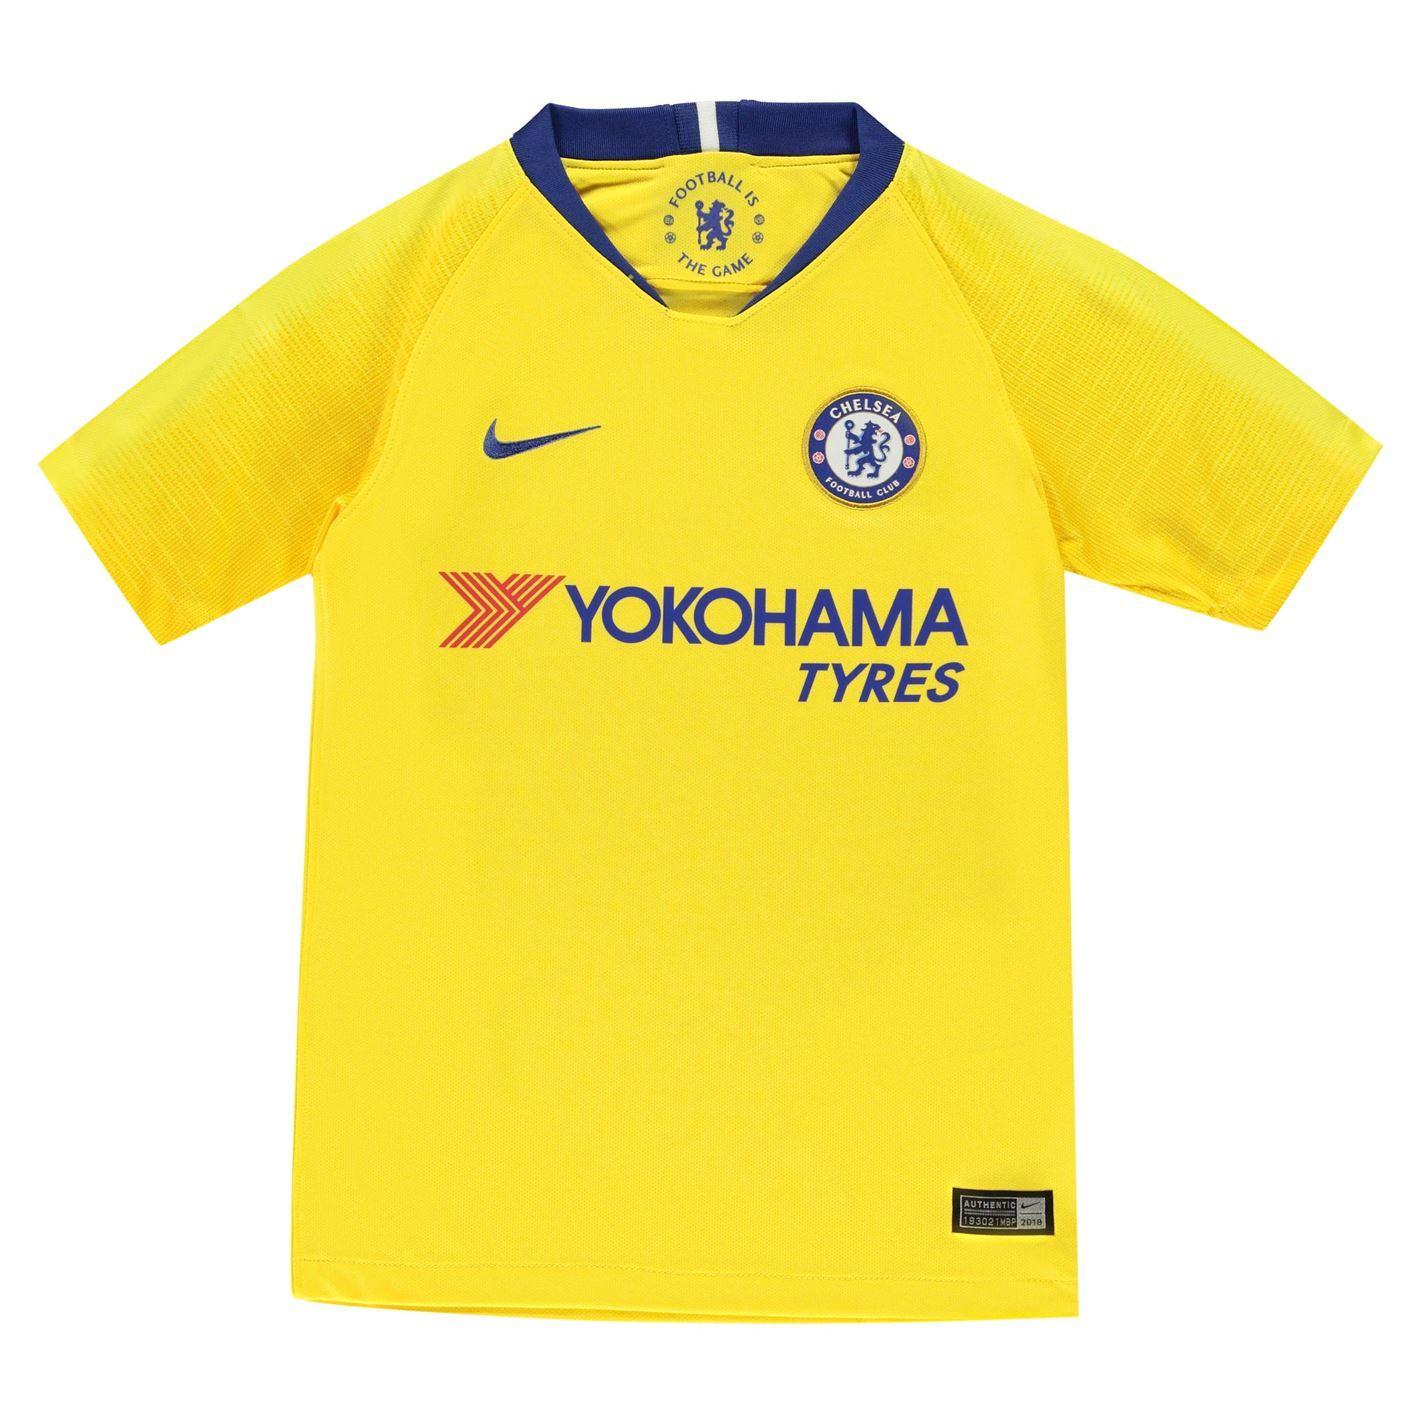 ccac95e70dc Details about Nike Chelsea Away Jersey 2018 2019 Juniors Yellow Football  Soccer Fan Shirt Top